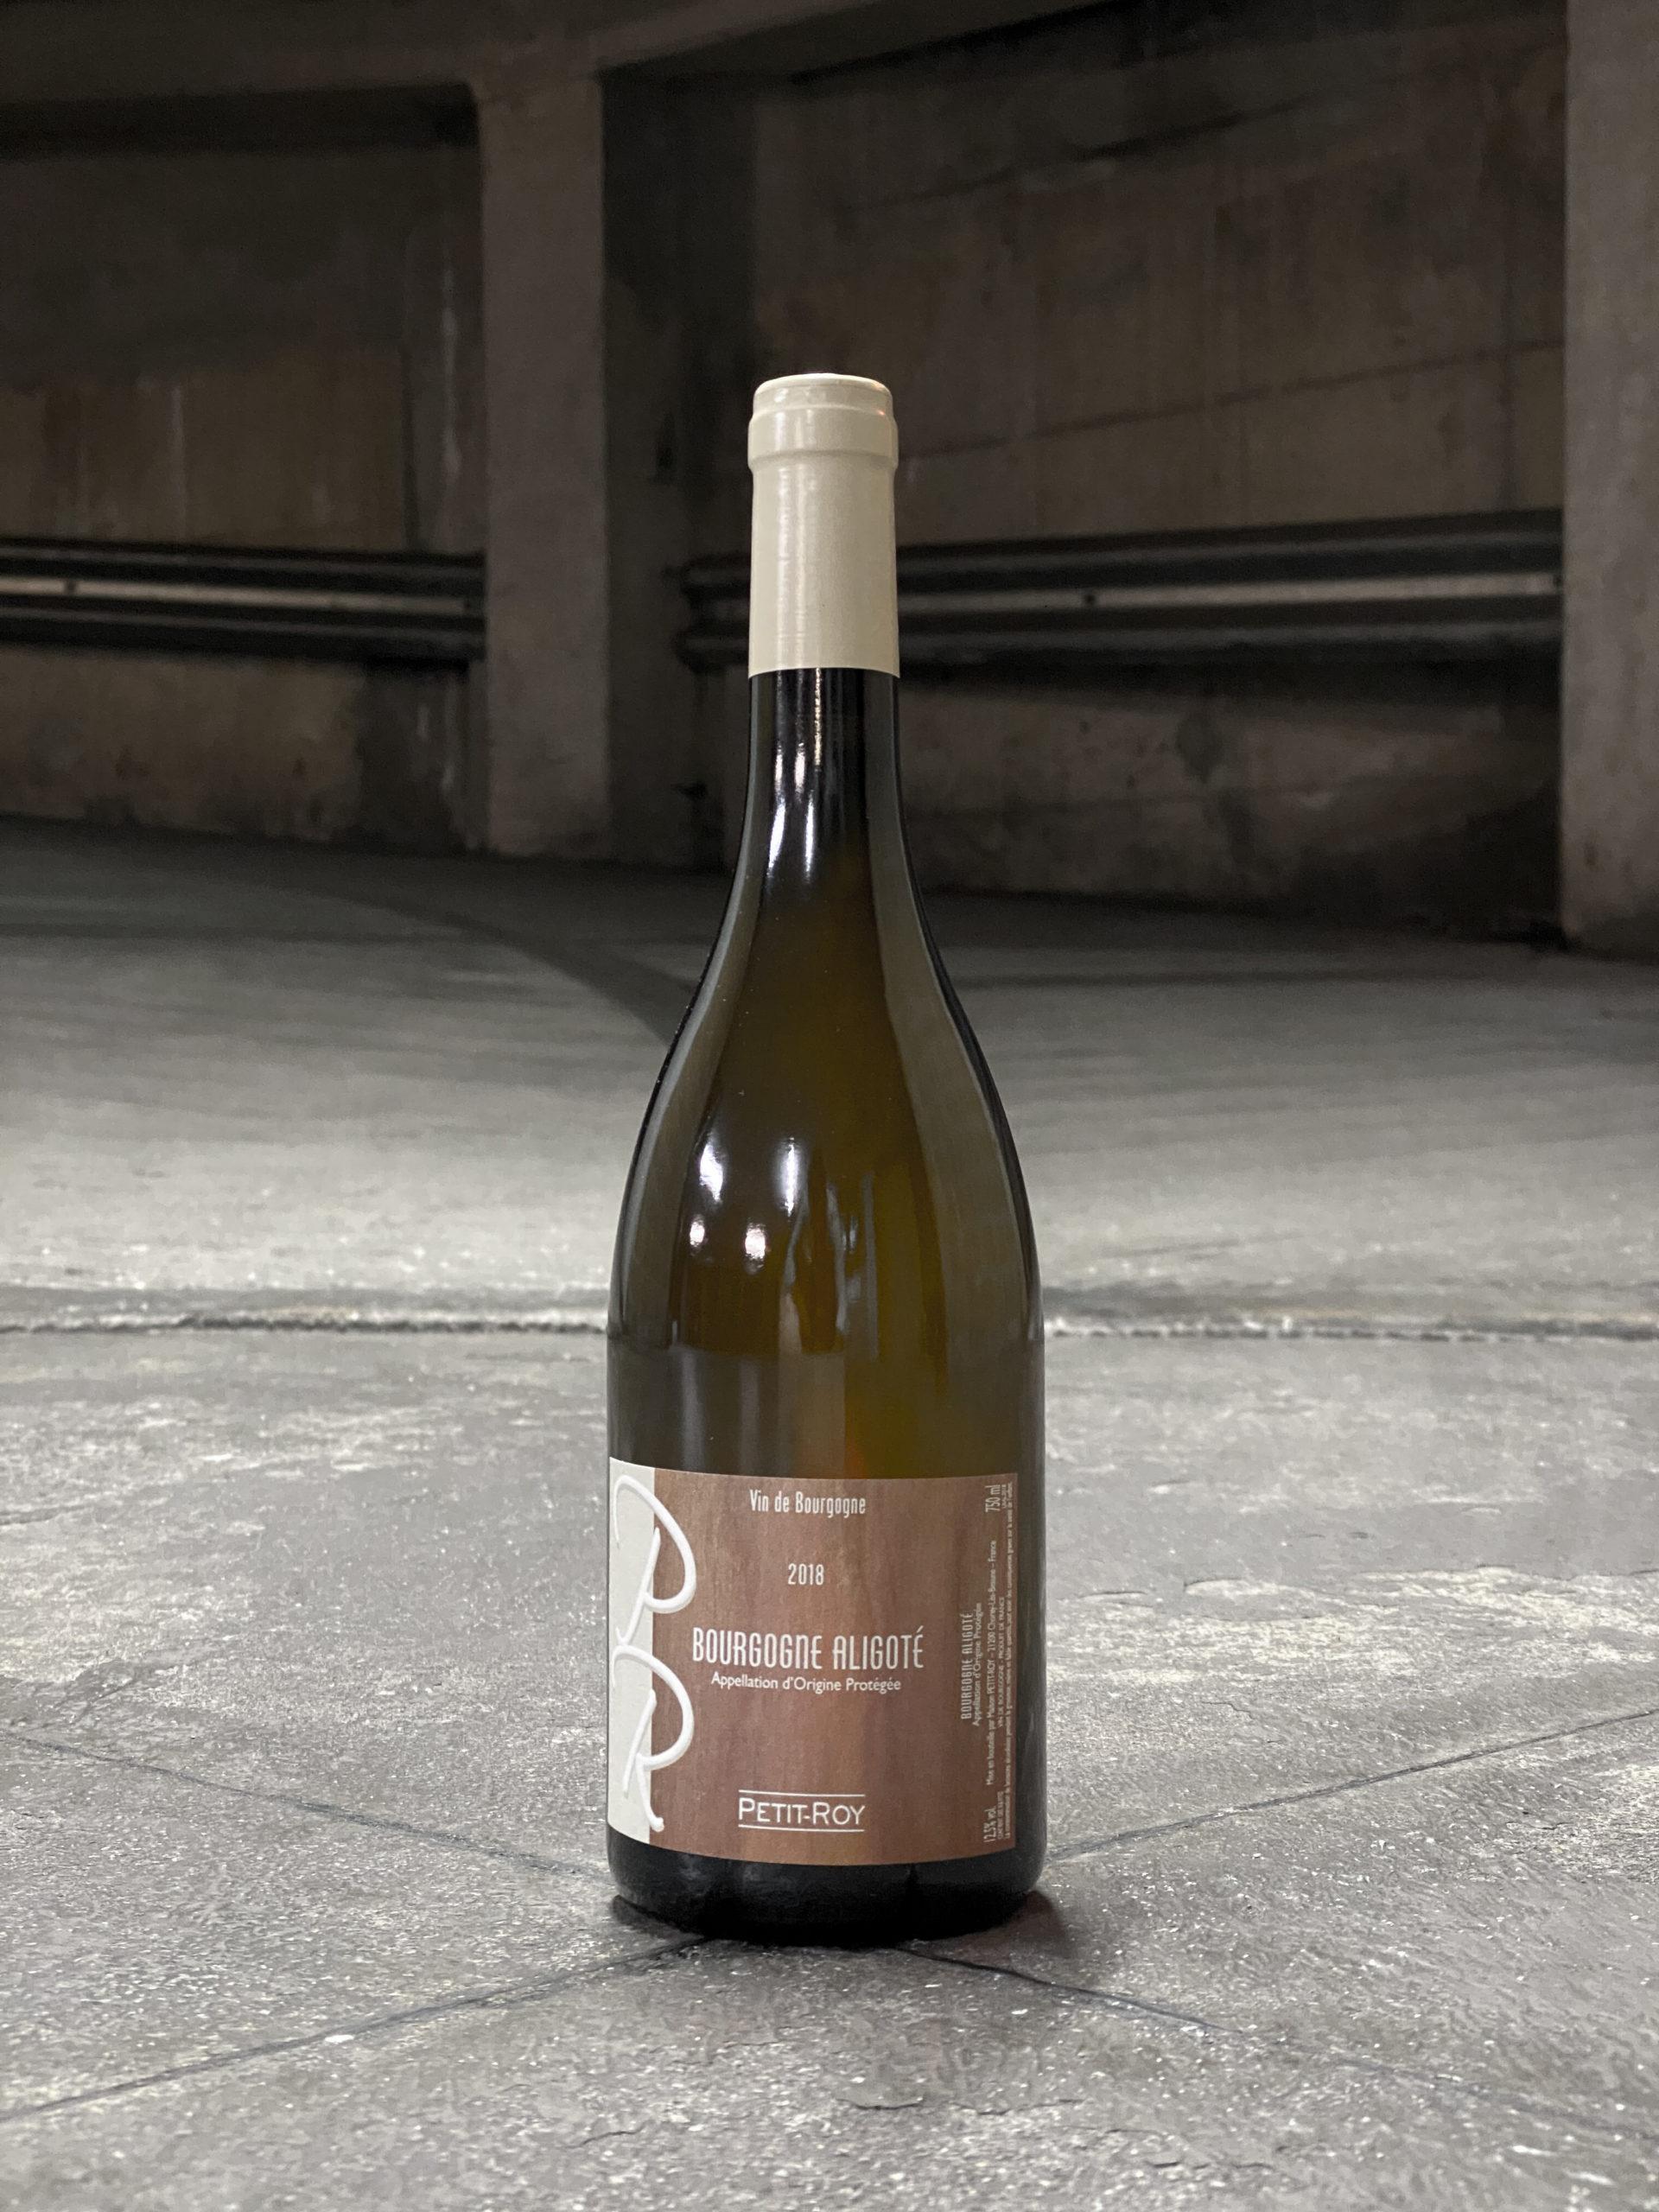 Petit Roy Bourgogne Aligoté